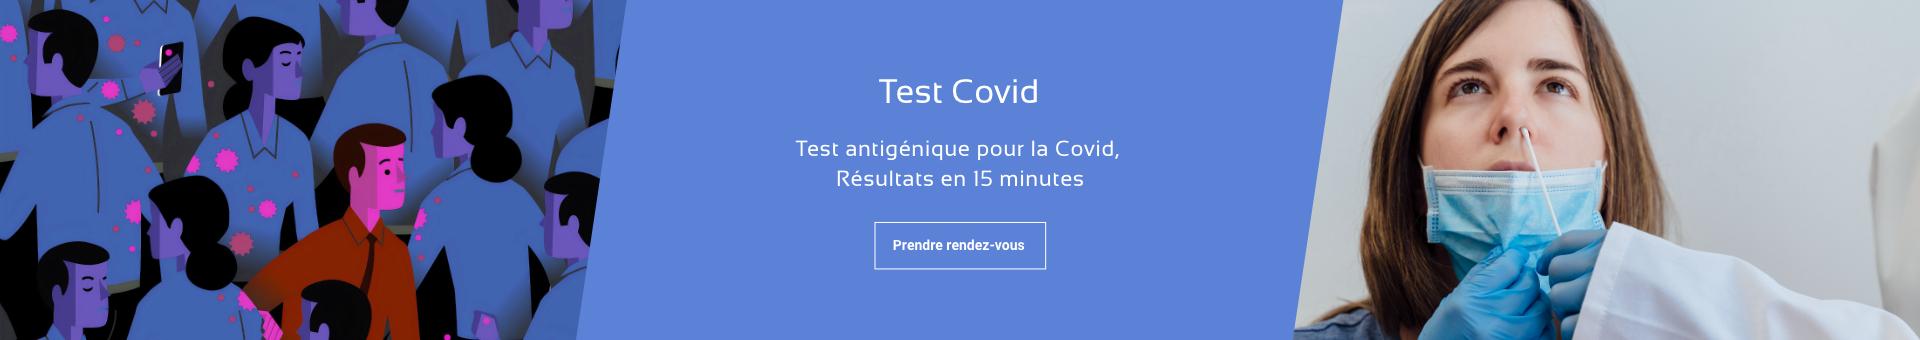 pharmacie test covid muret